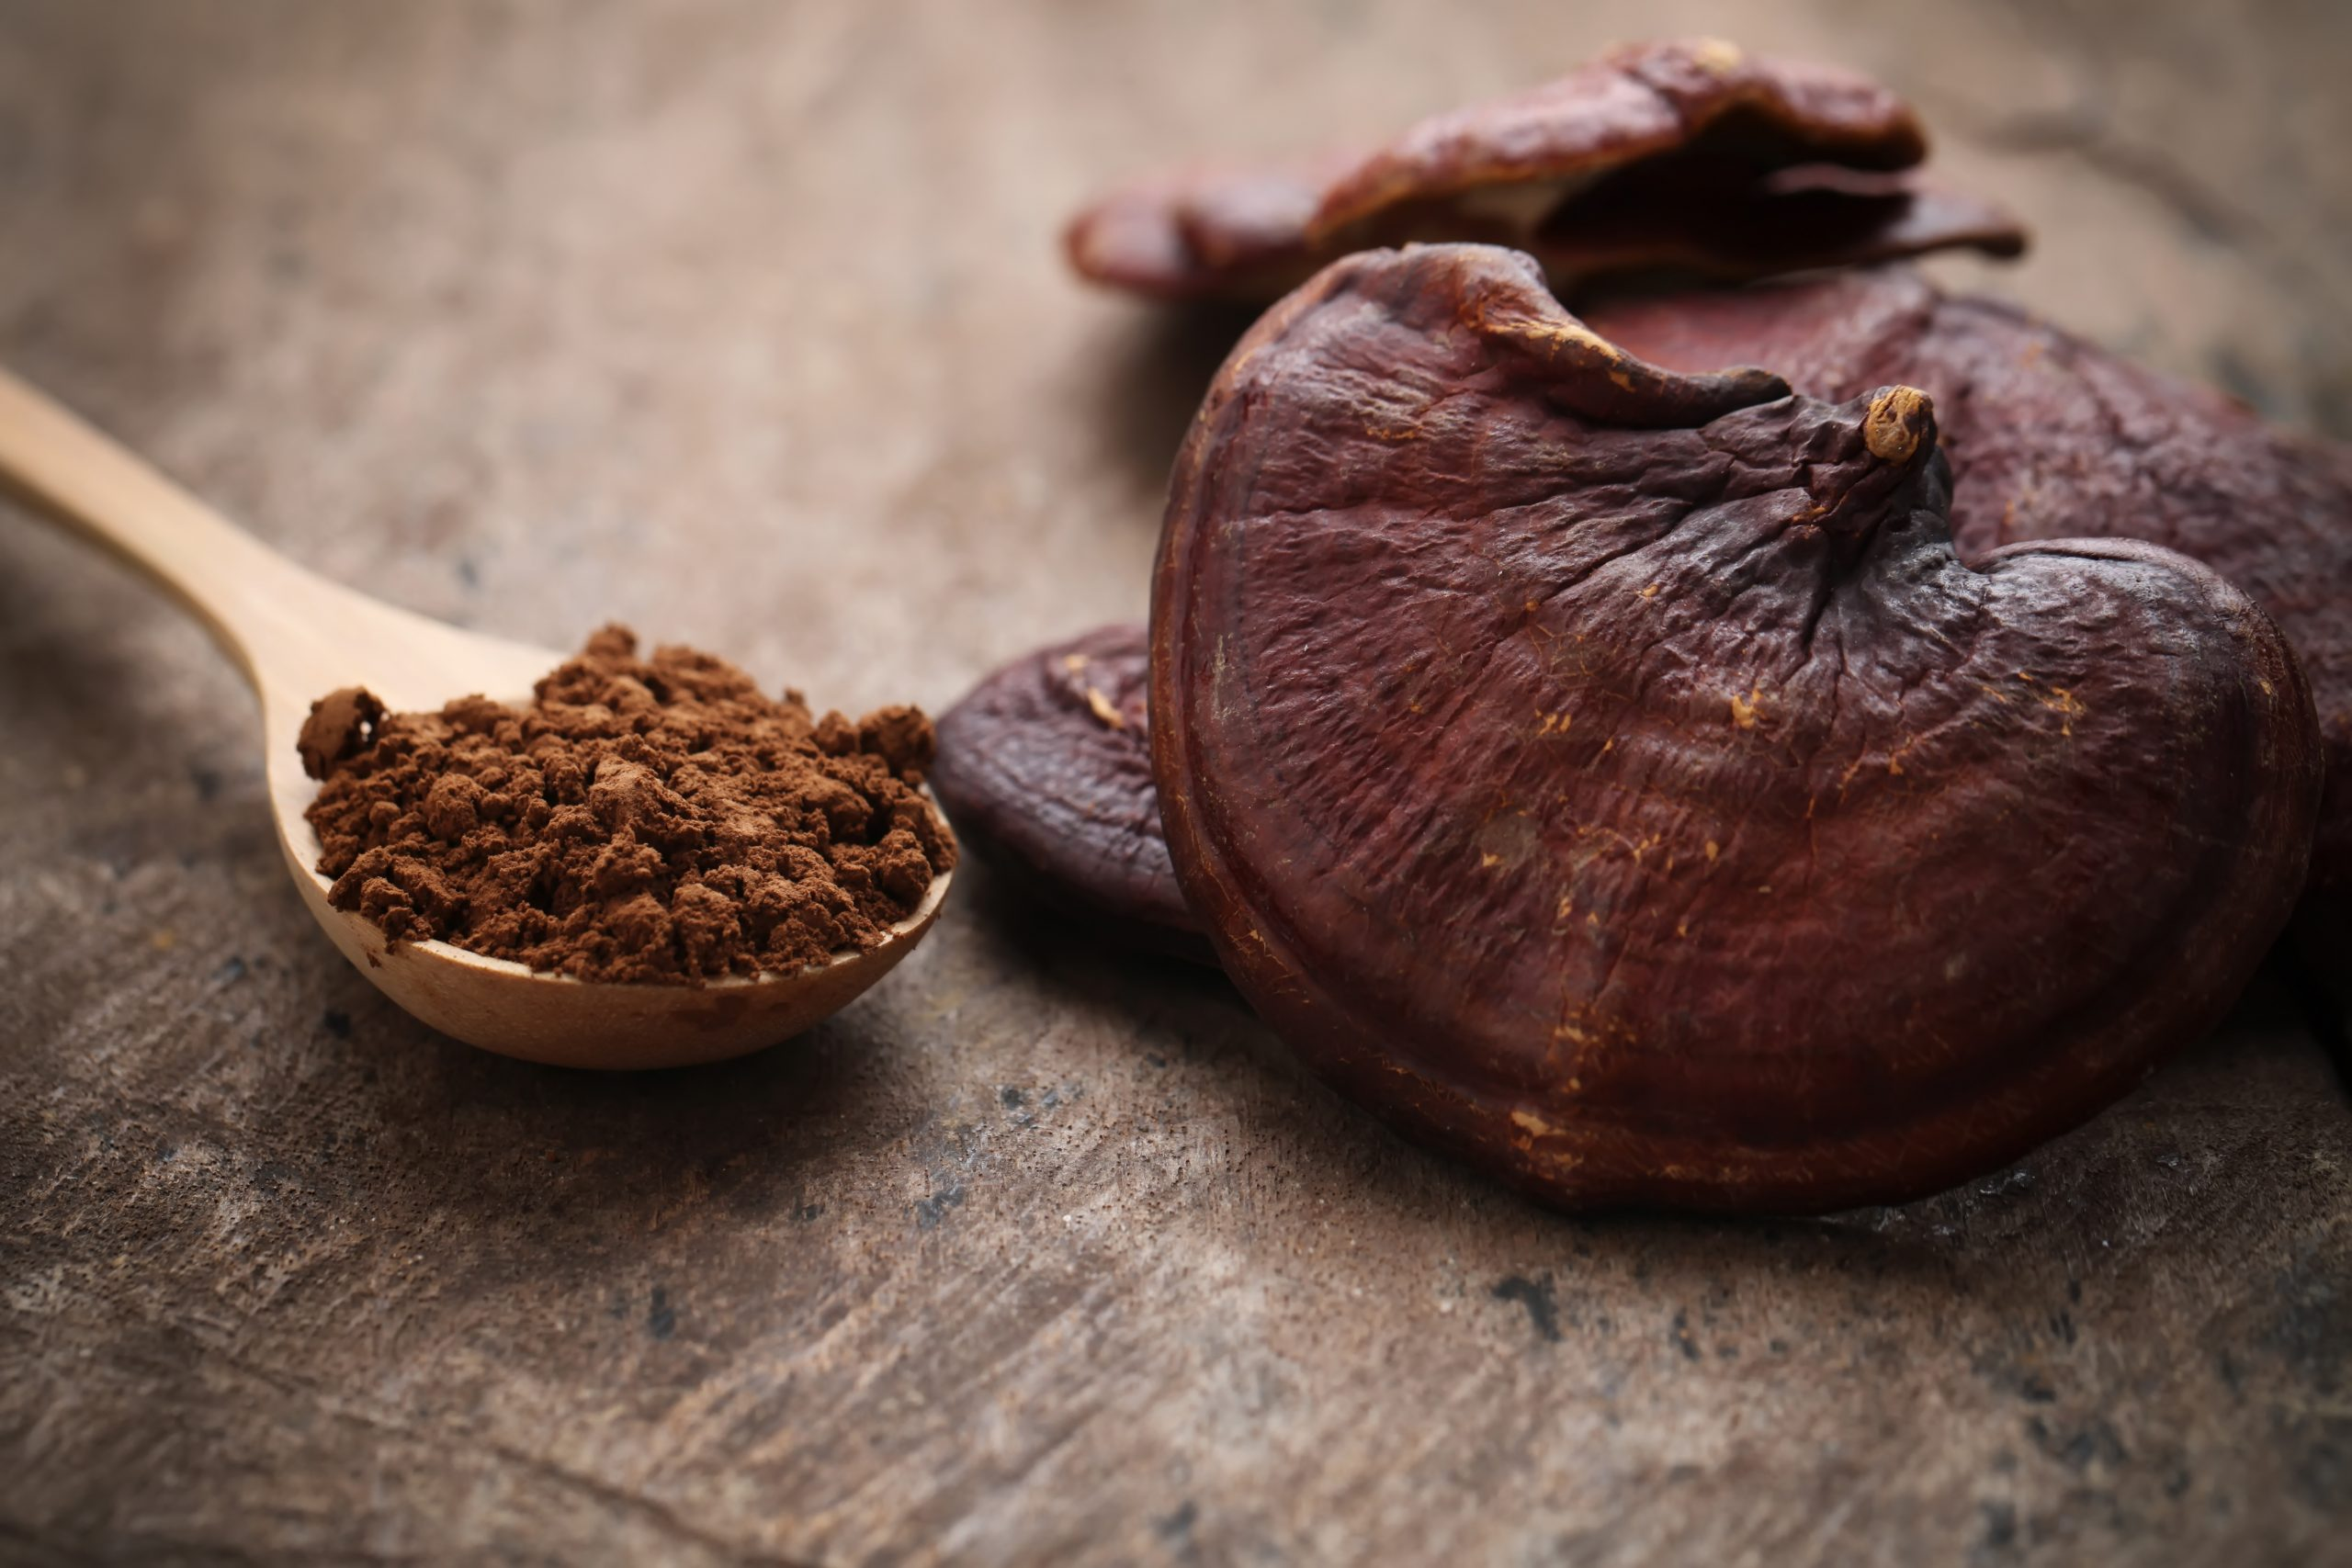 Ganoderma Lucidum Mushroom on wooden background